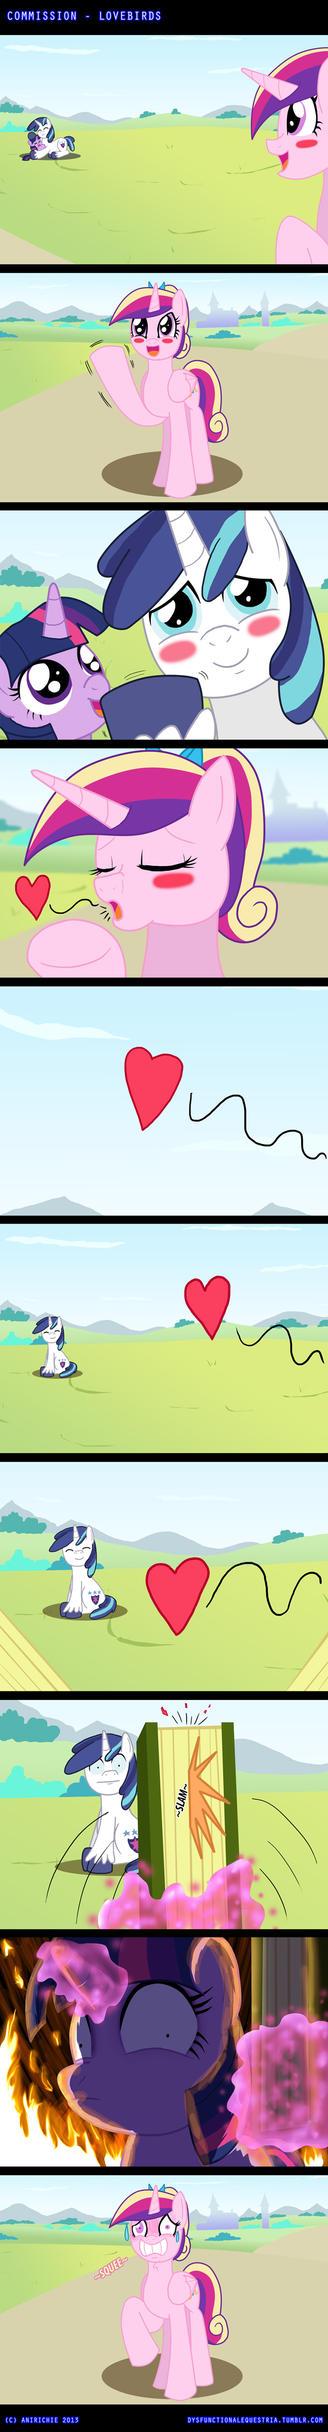 COM - Lovebirds (COMIC) by AniRichie-Art